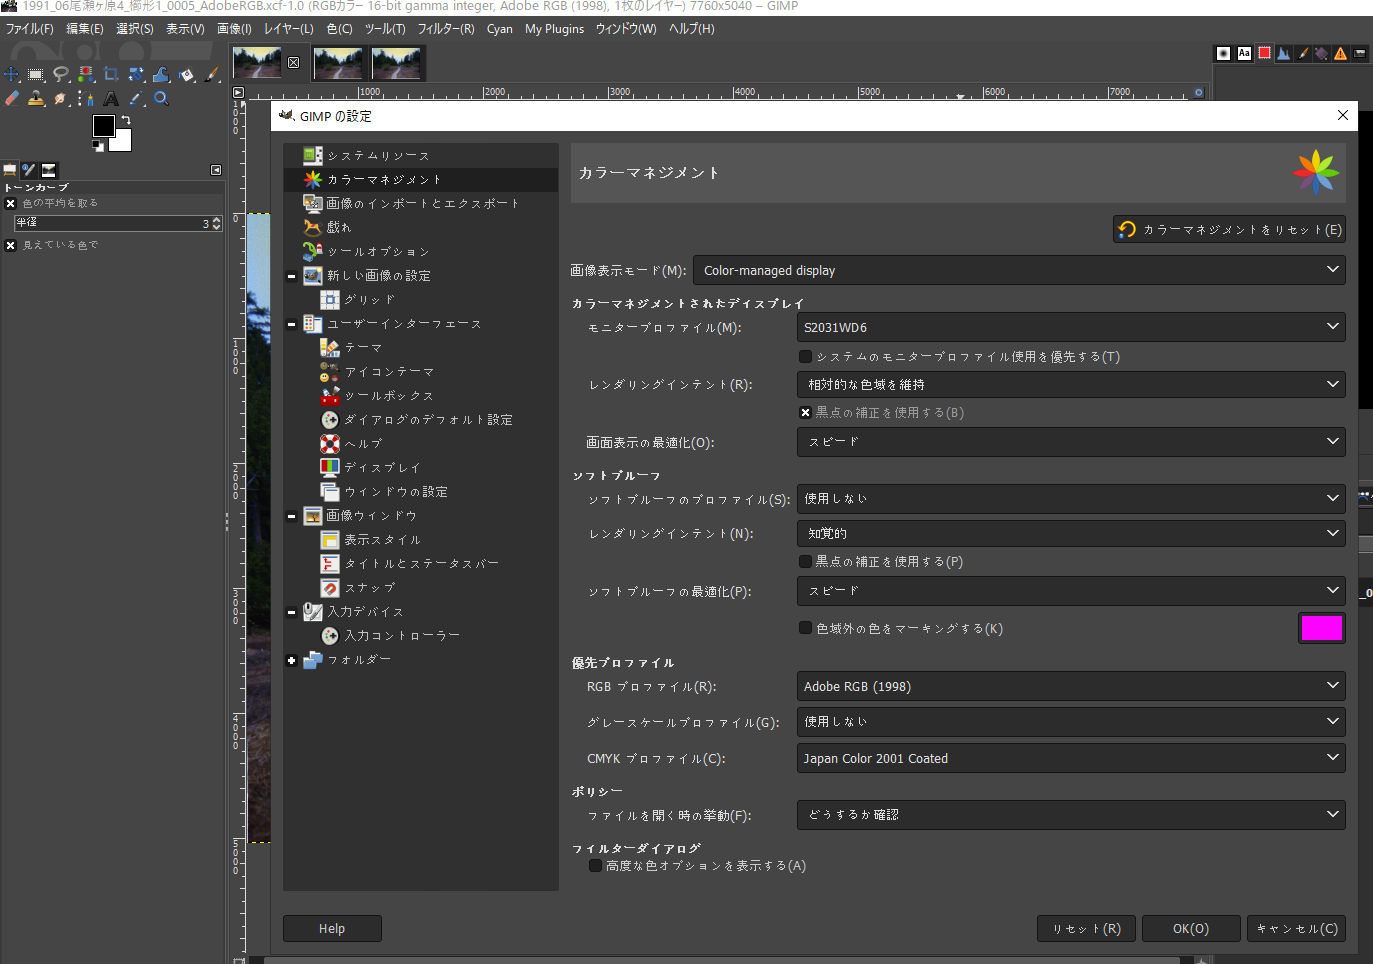 f:id:yasuo_ssi:20201106100004j:plain